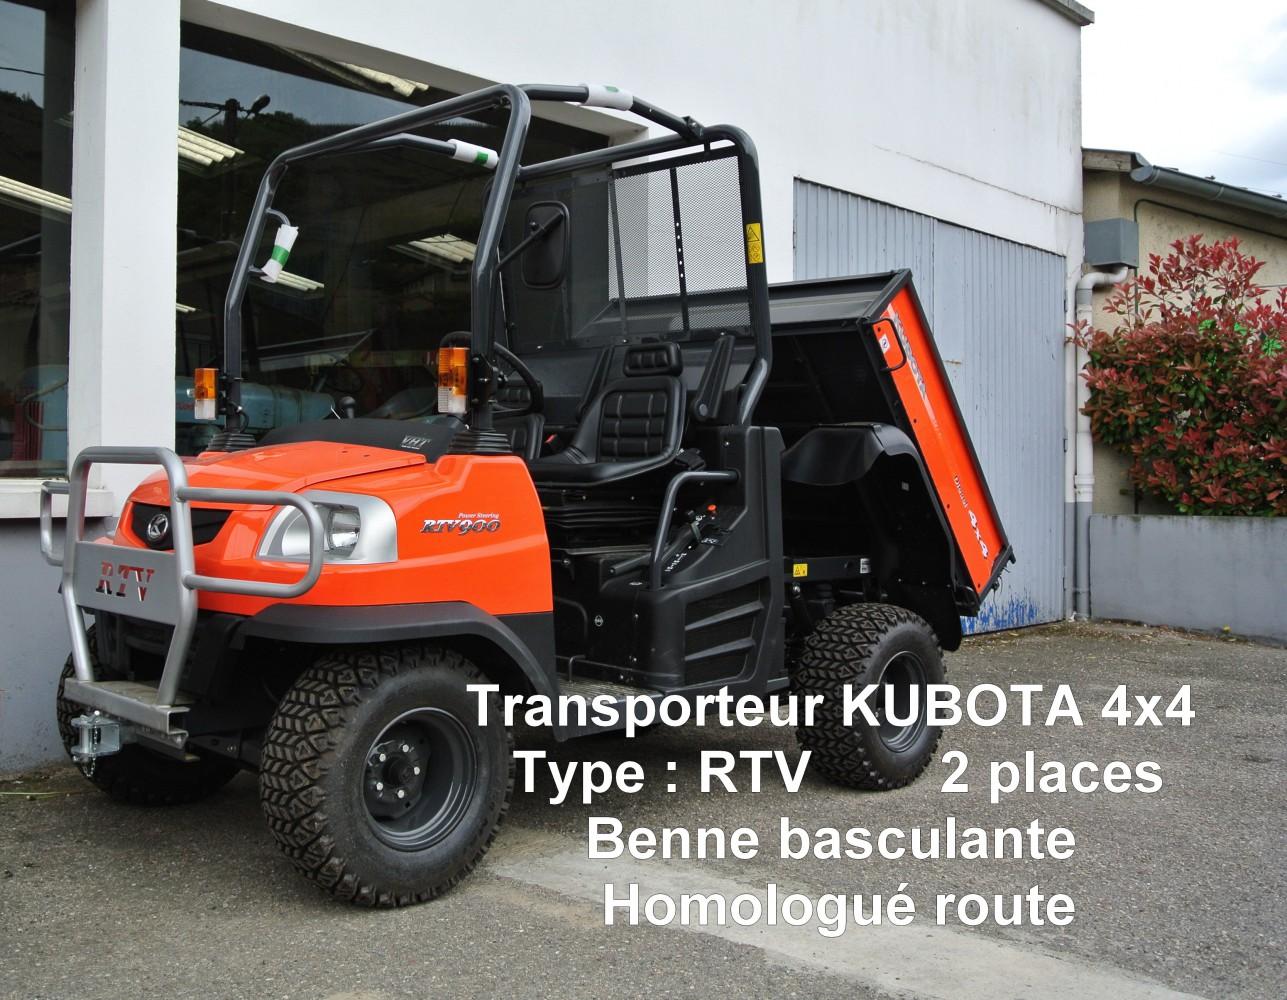 Transporteur KUBOTA 4x4